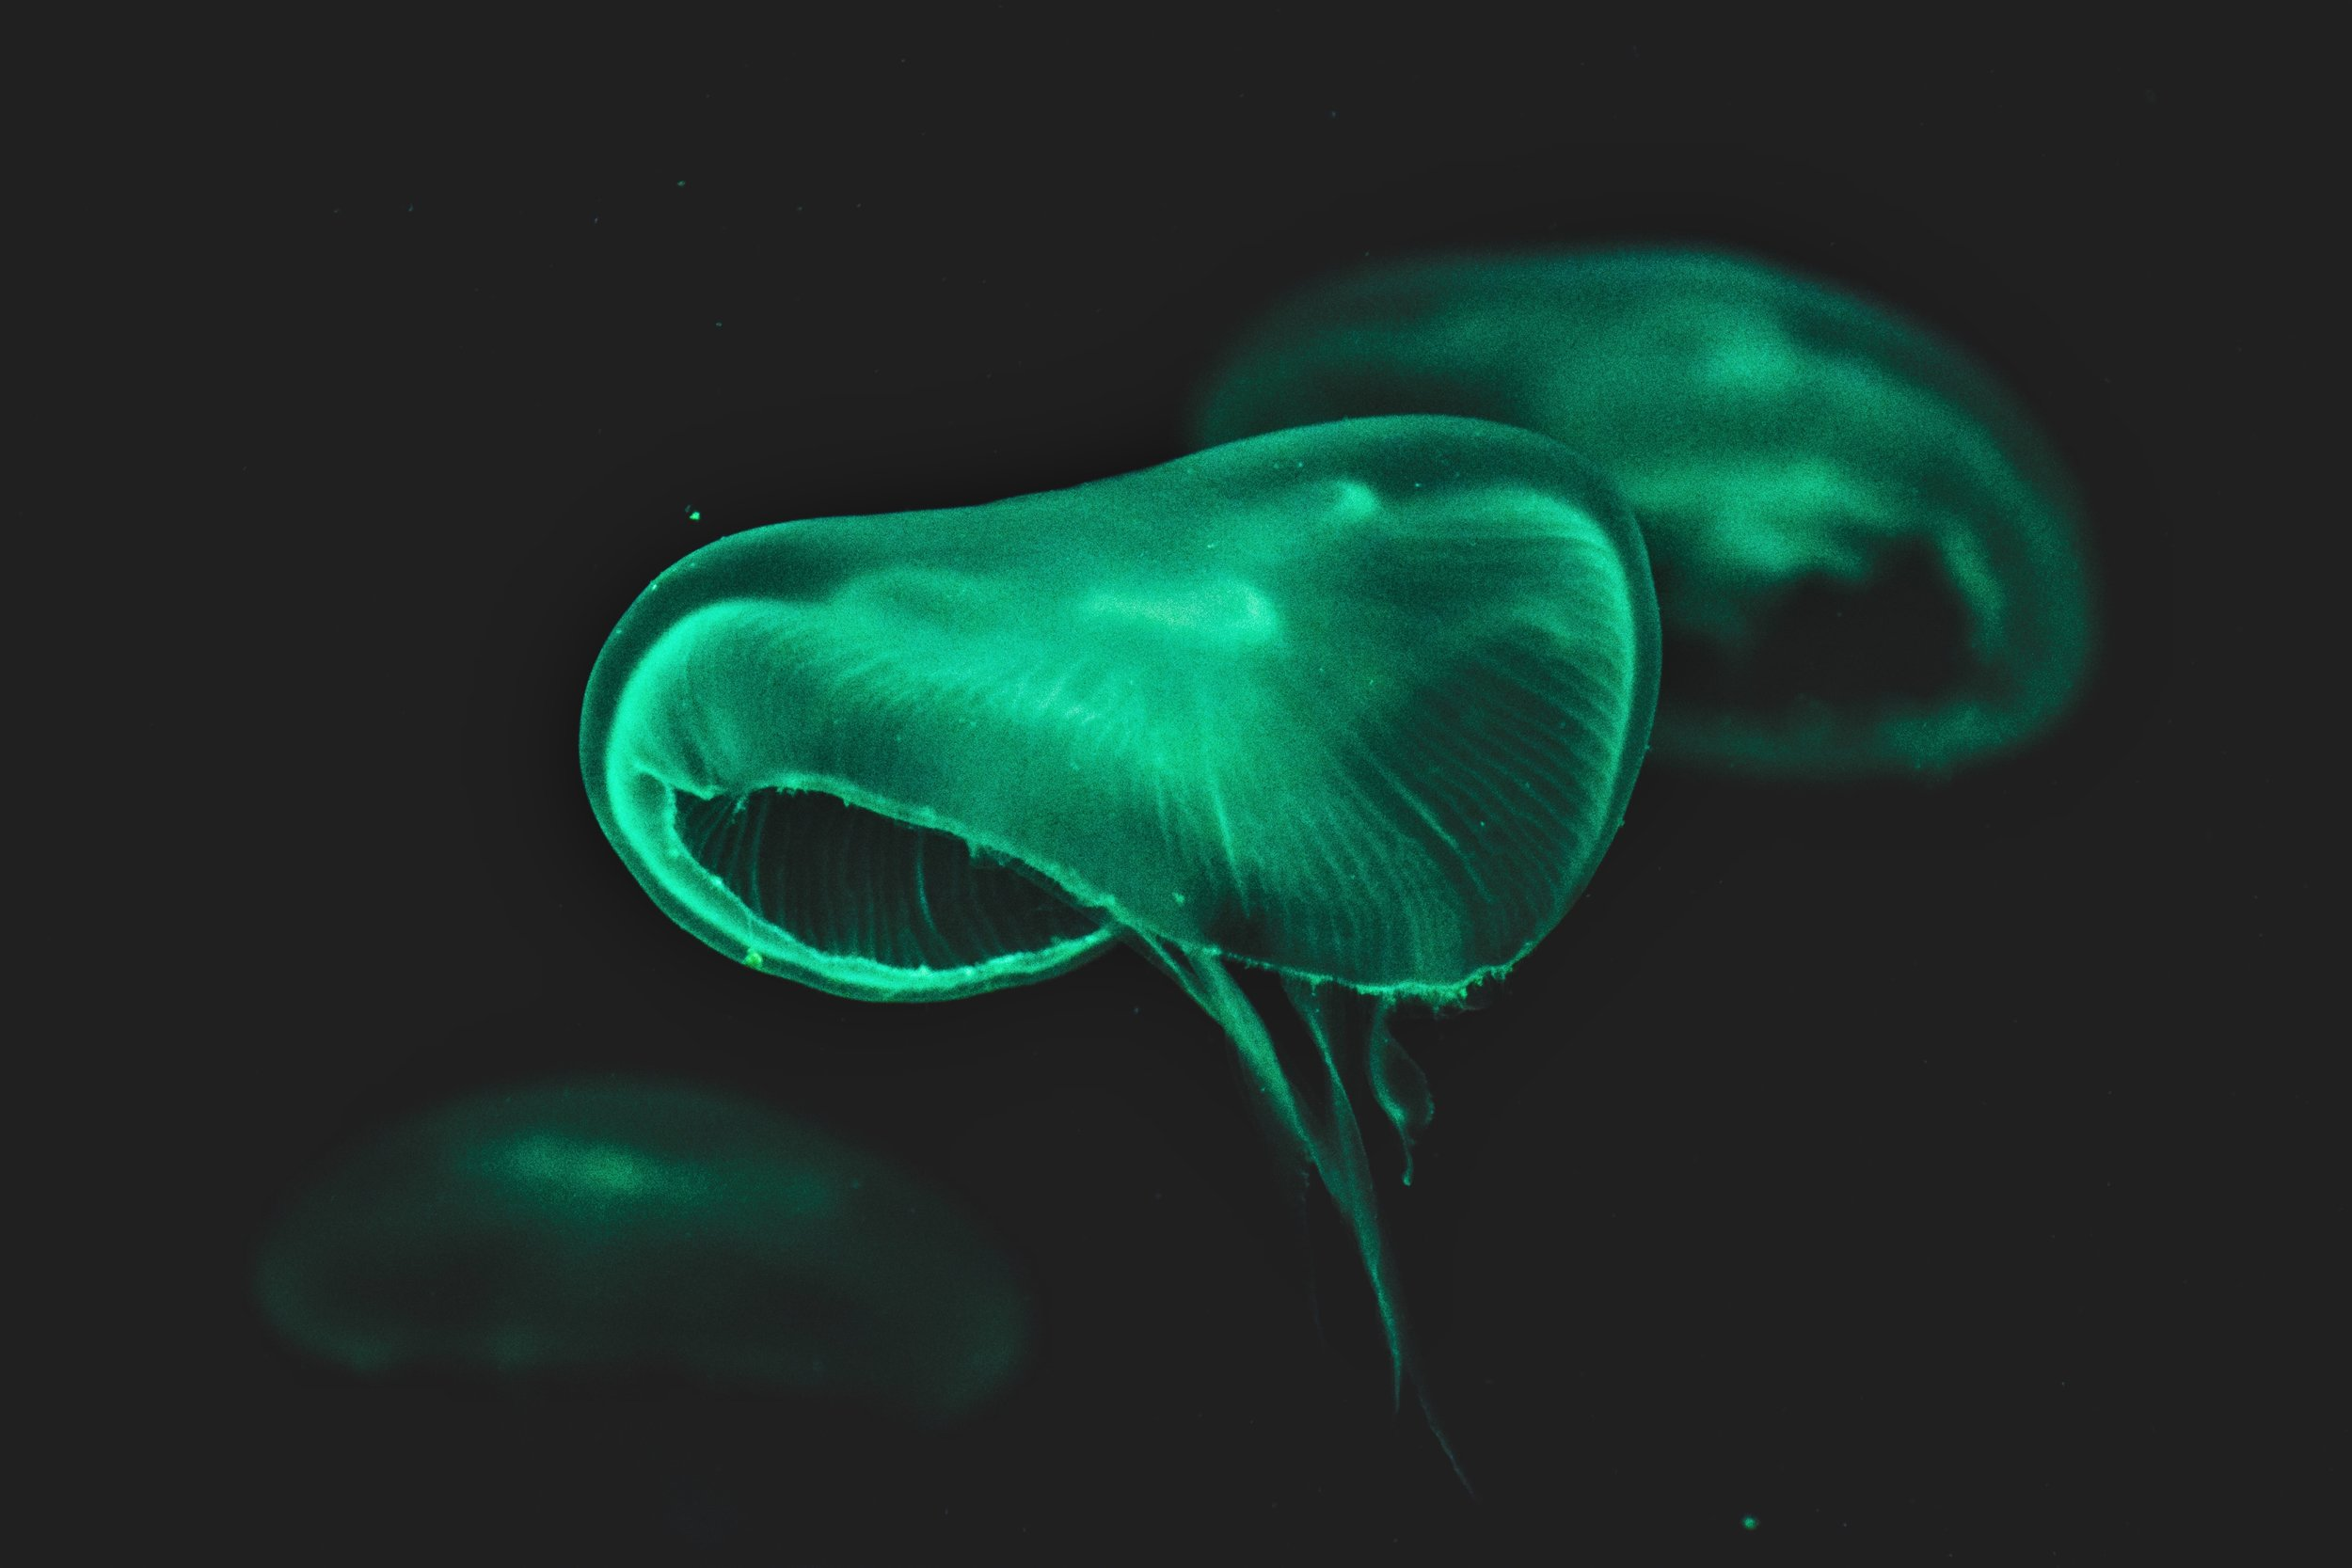 Photography by Smit Patel: bioluminescent medusa jellyfish